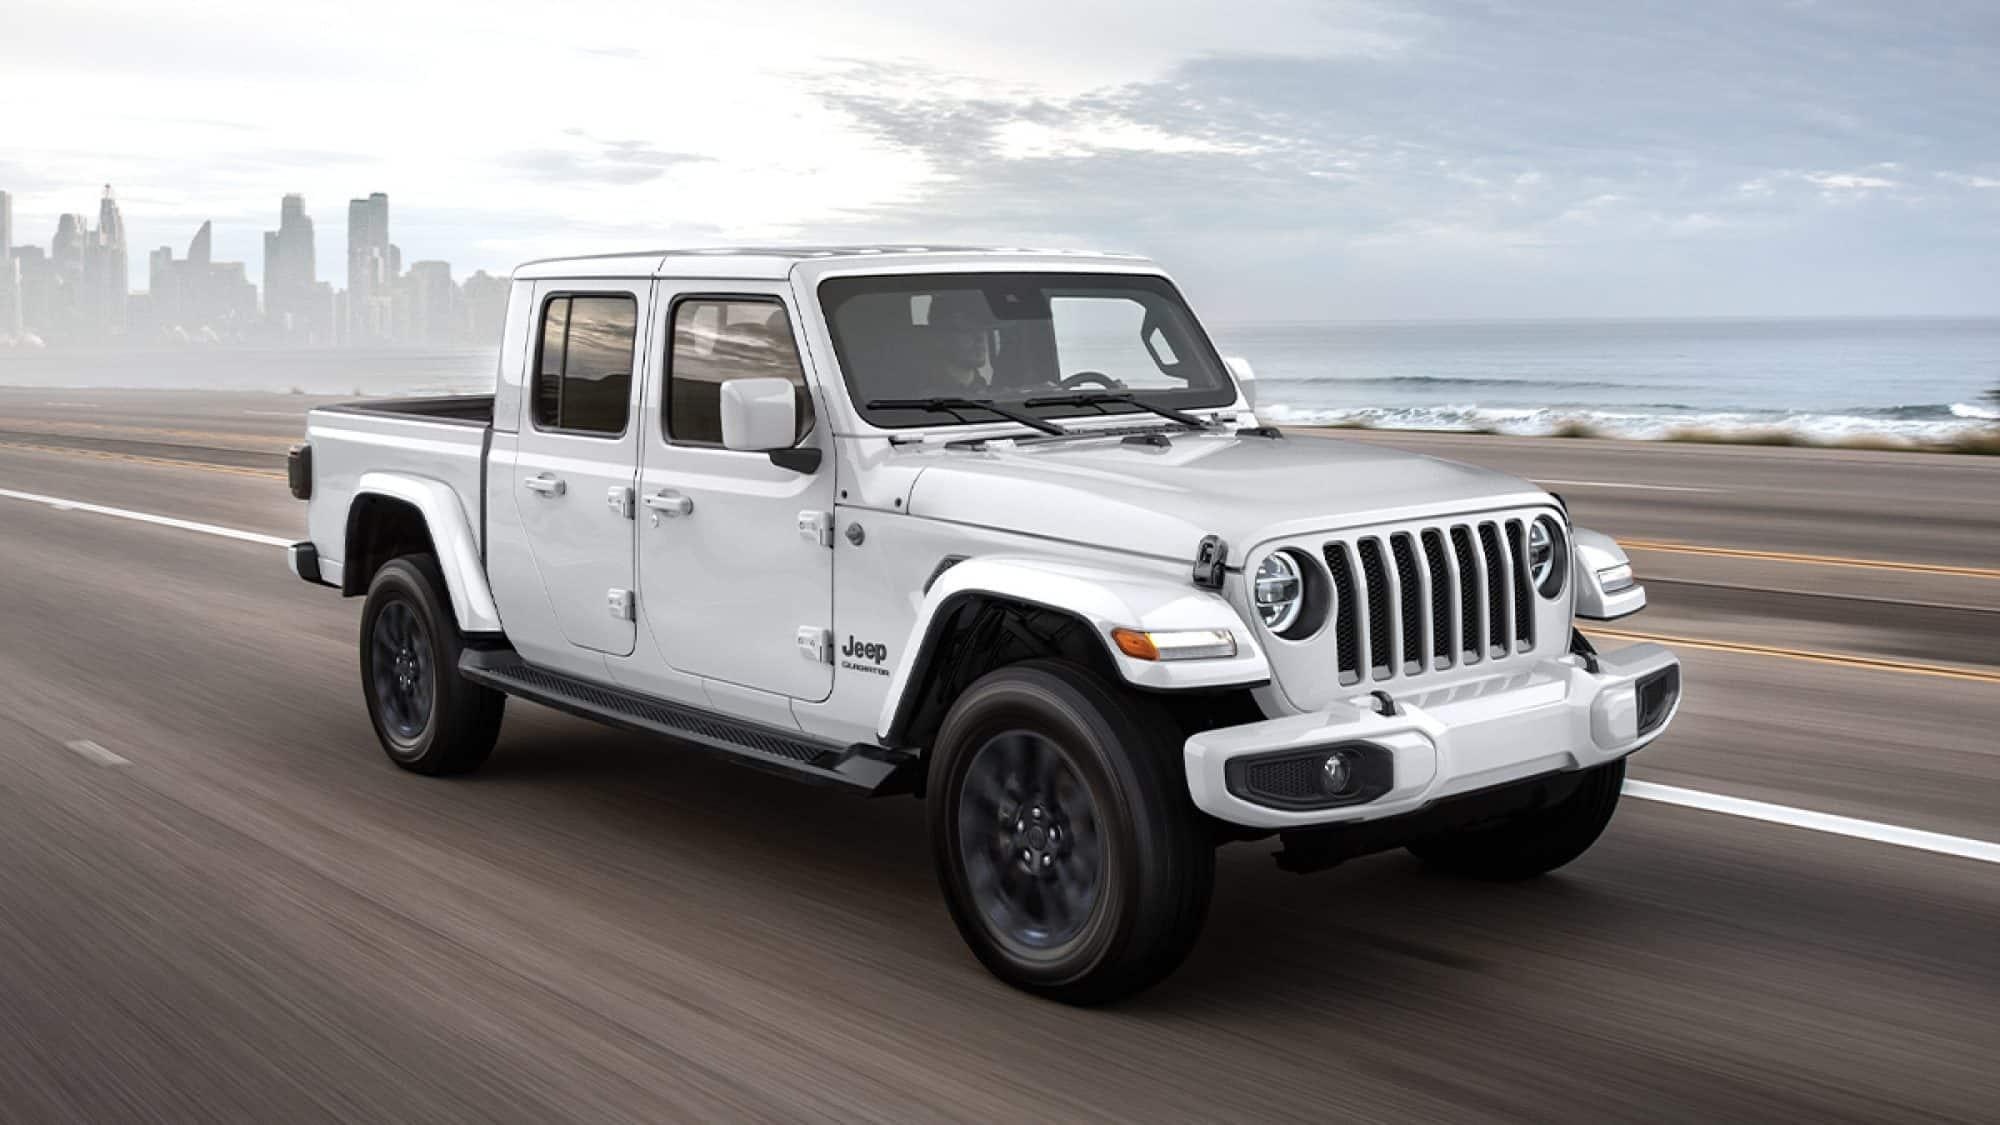 Jeep Ram Chelsea MI